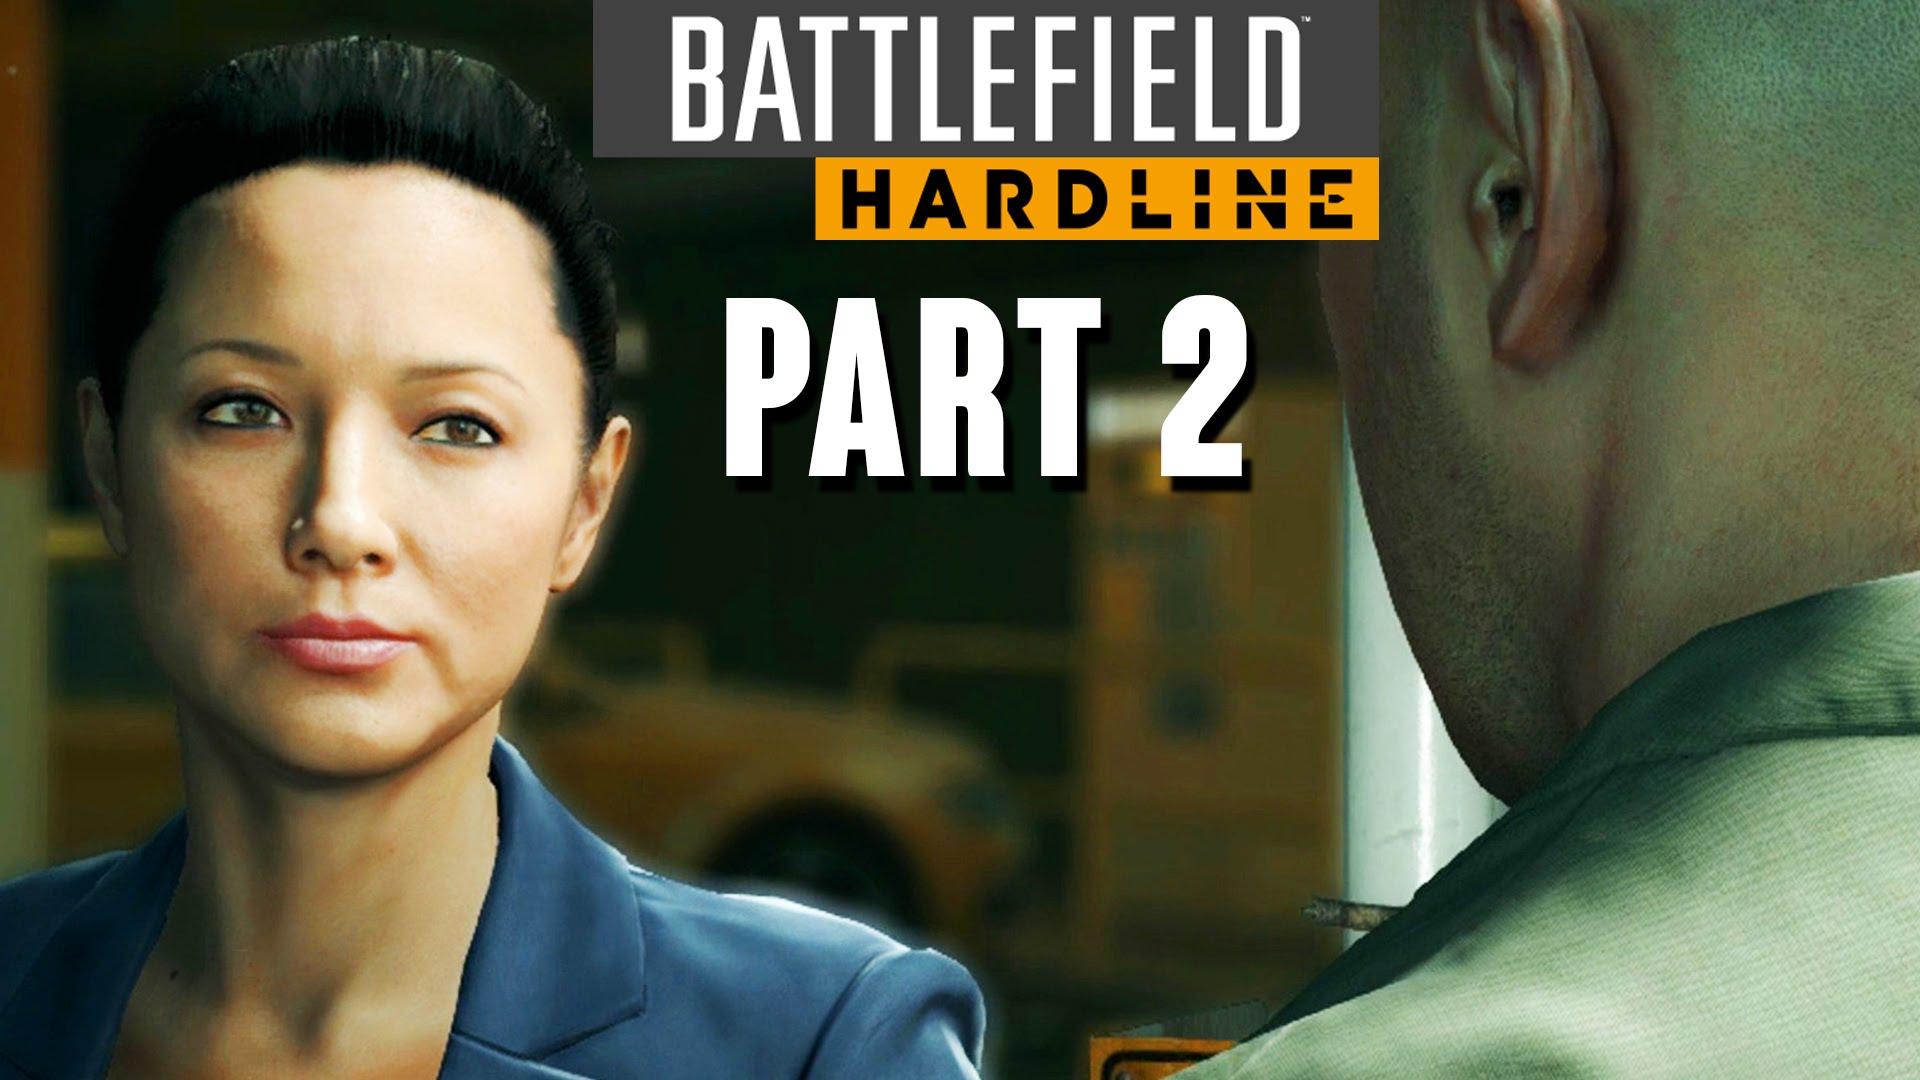 بتلفیلد هاردلاین مرحله2 - Battlefield Hardline-PC Part2